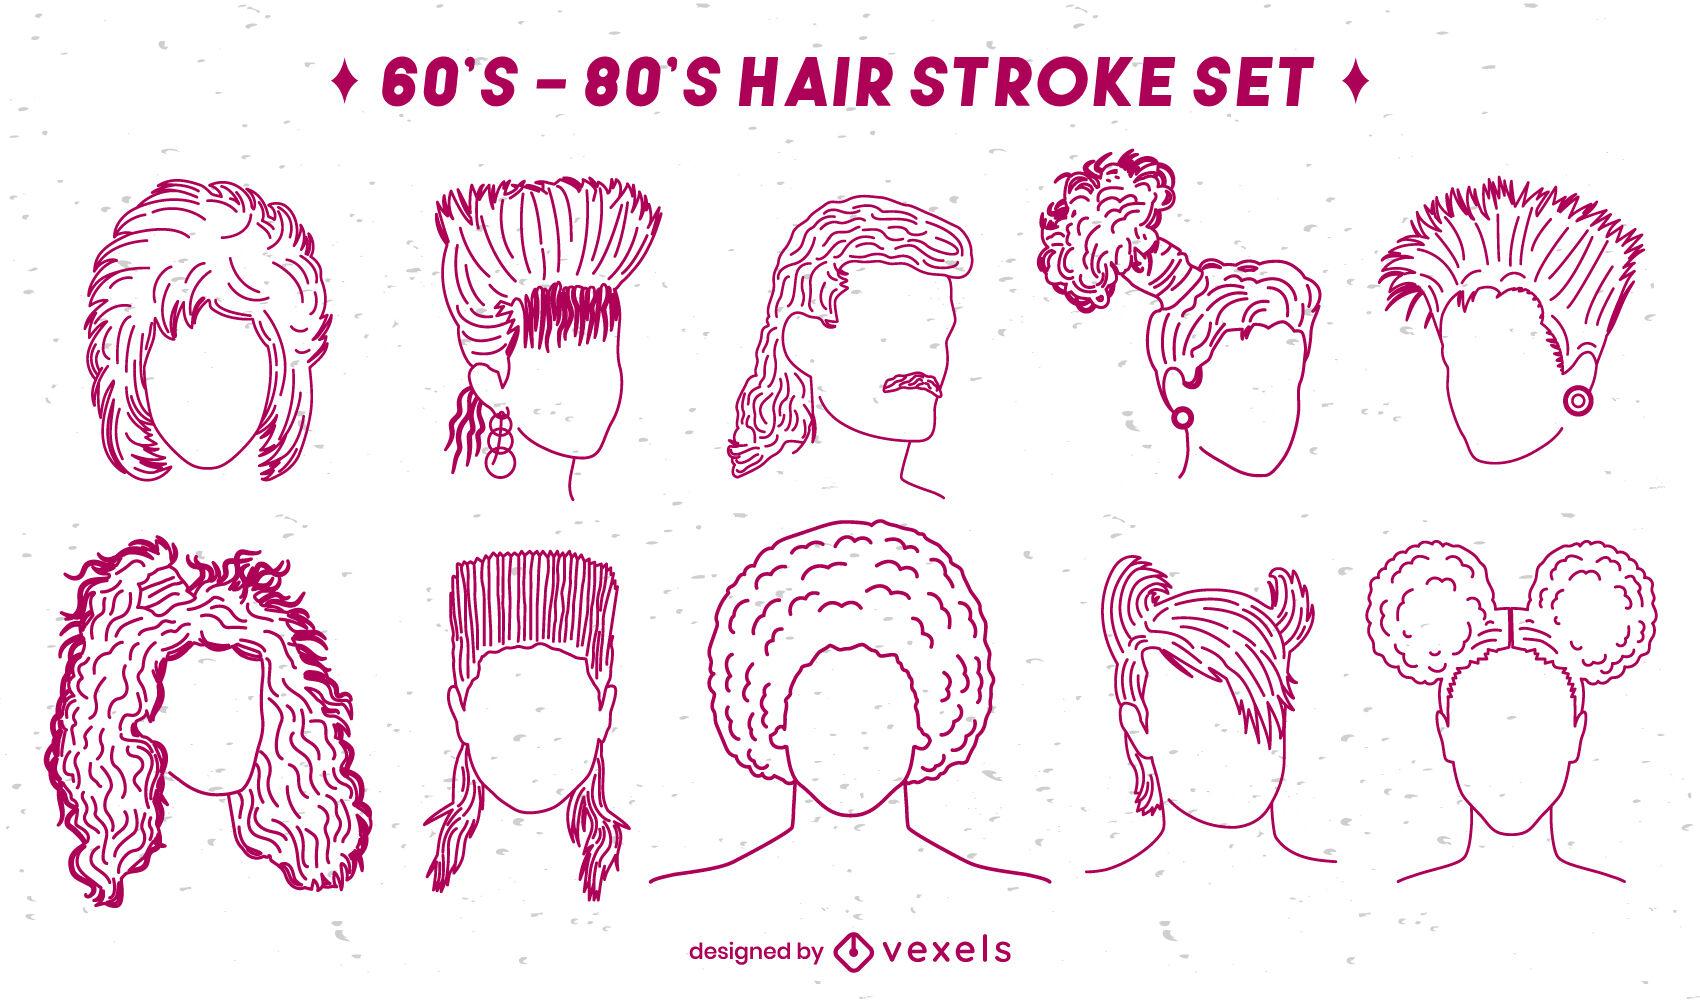 Retro 70s 80s set of hair styles stroke